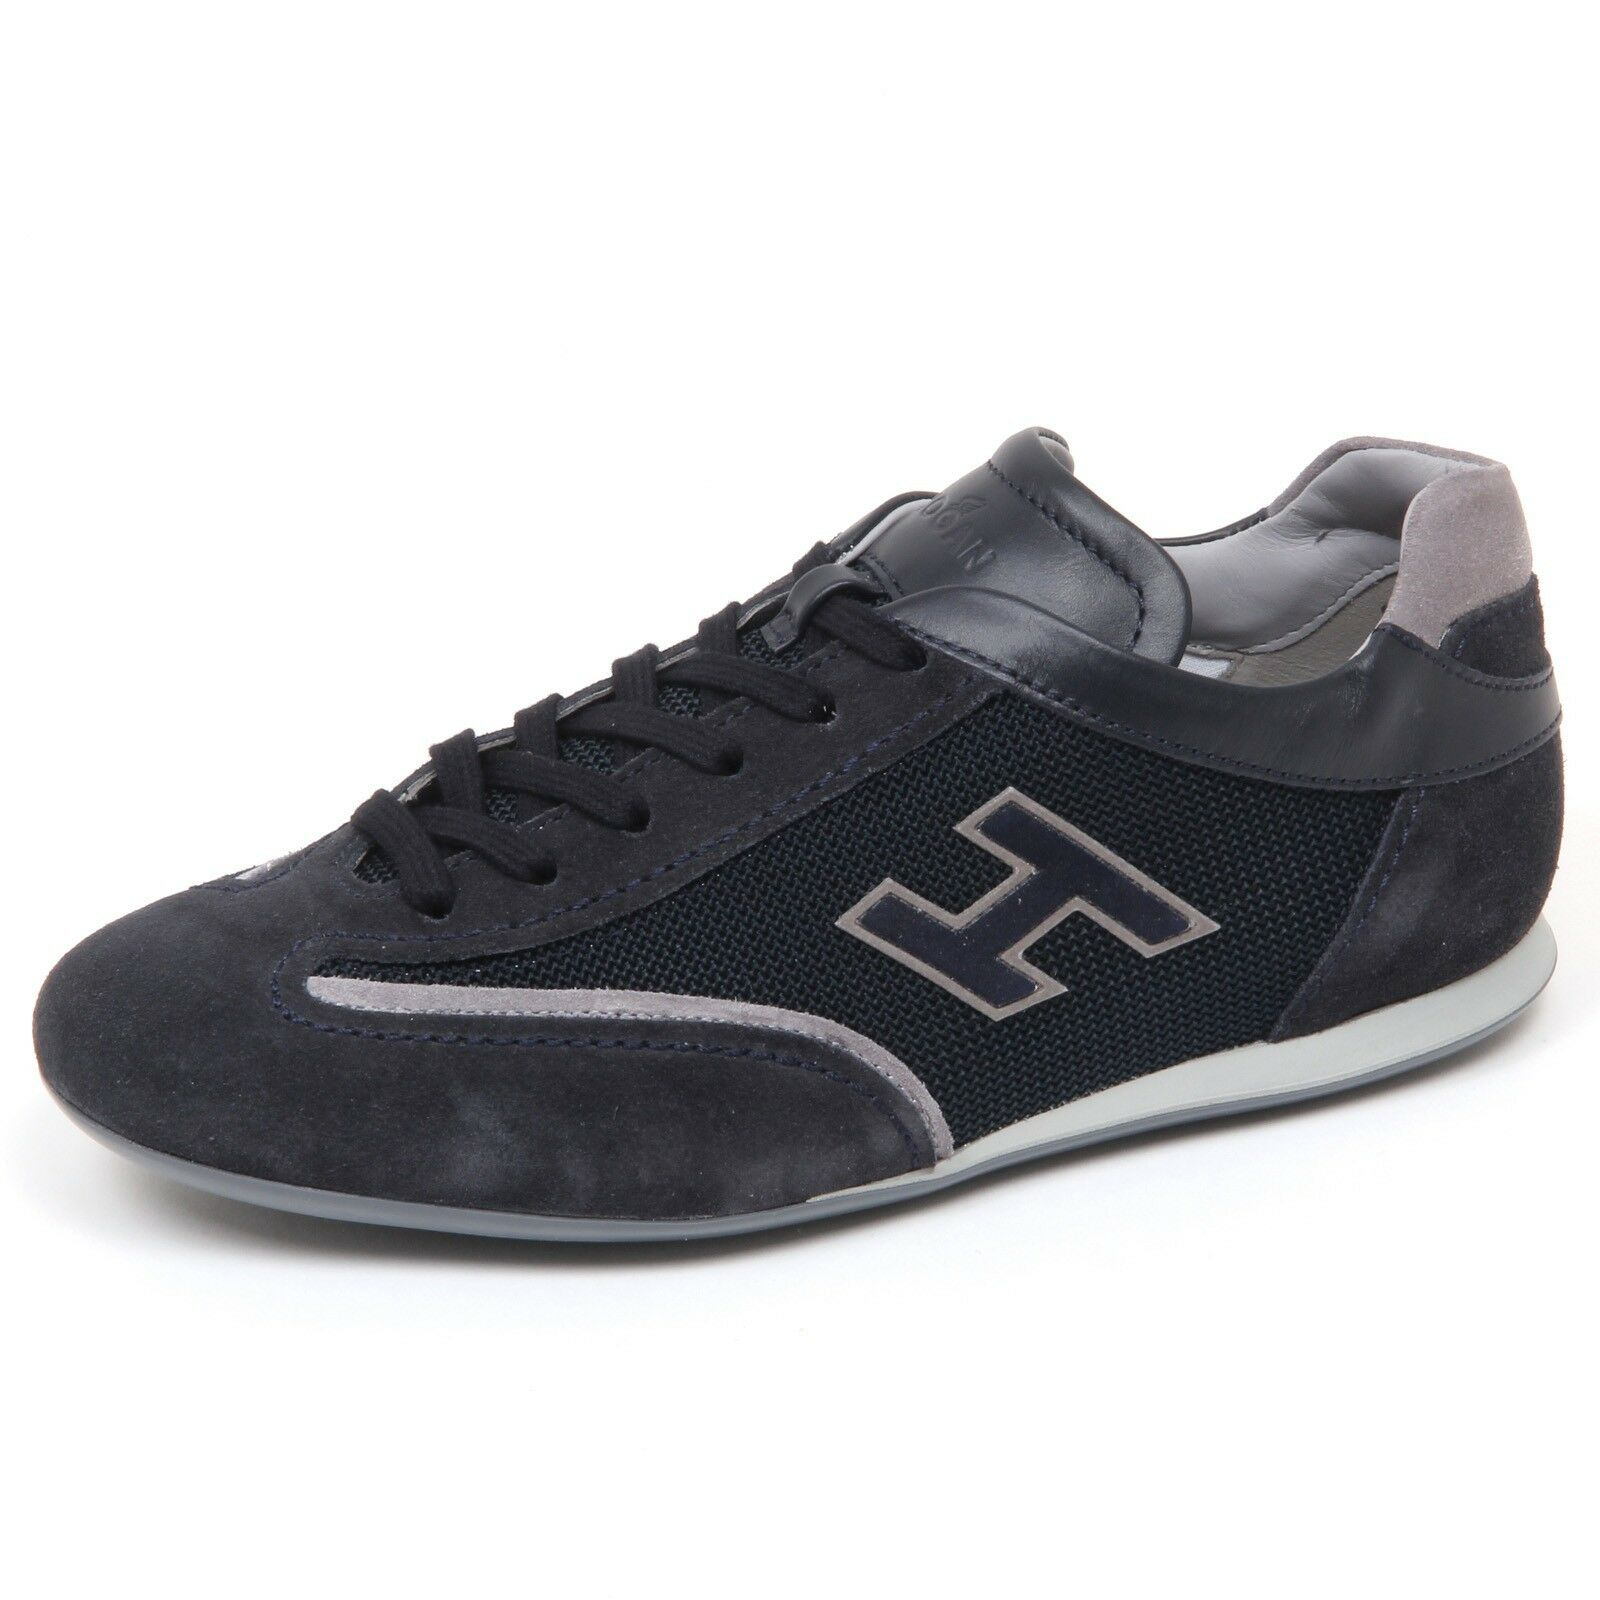 e9048 sneaker uomo blu hogan olympia scarpe slash h flock shoe man